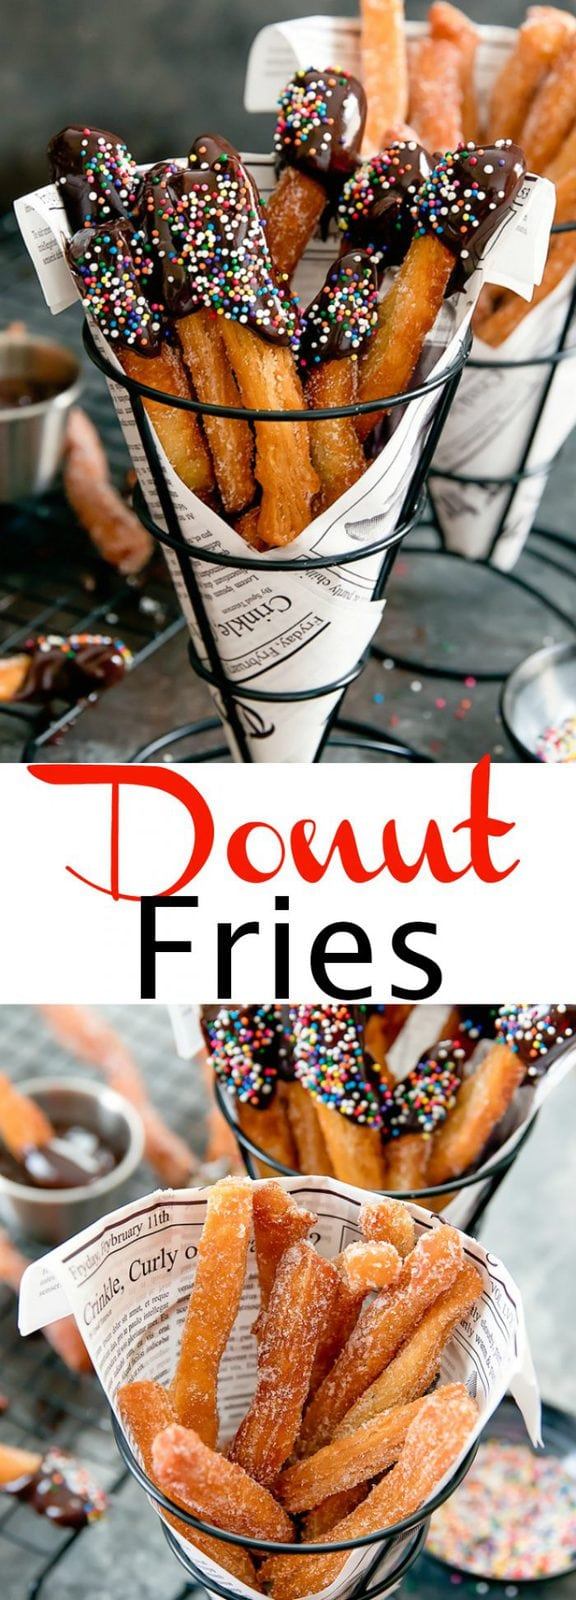 Donut Fries